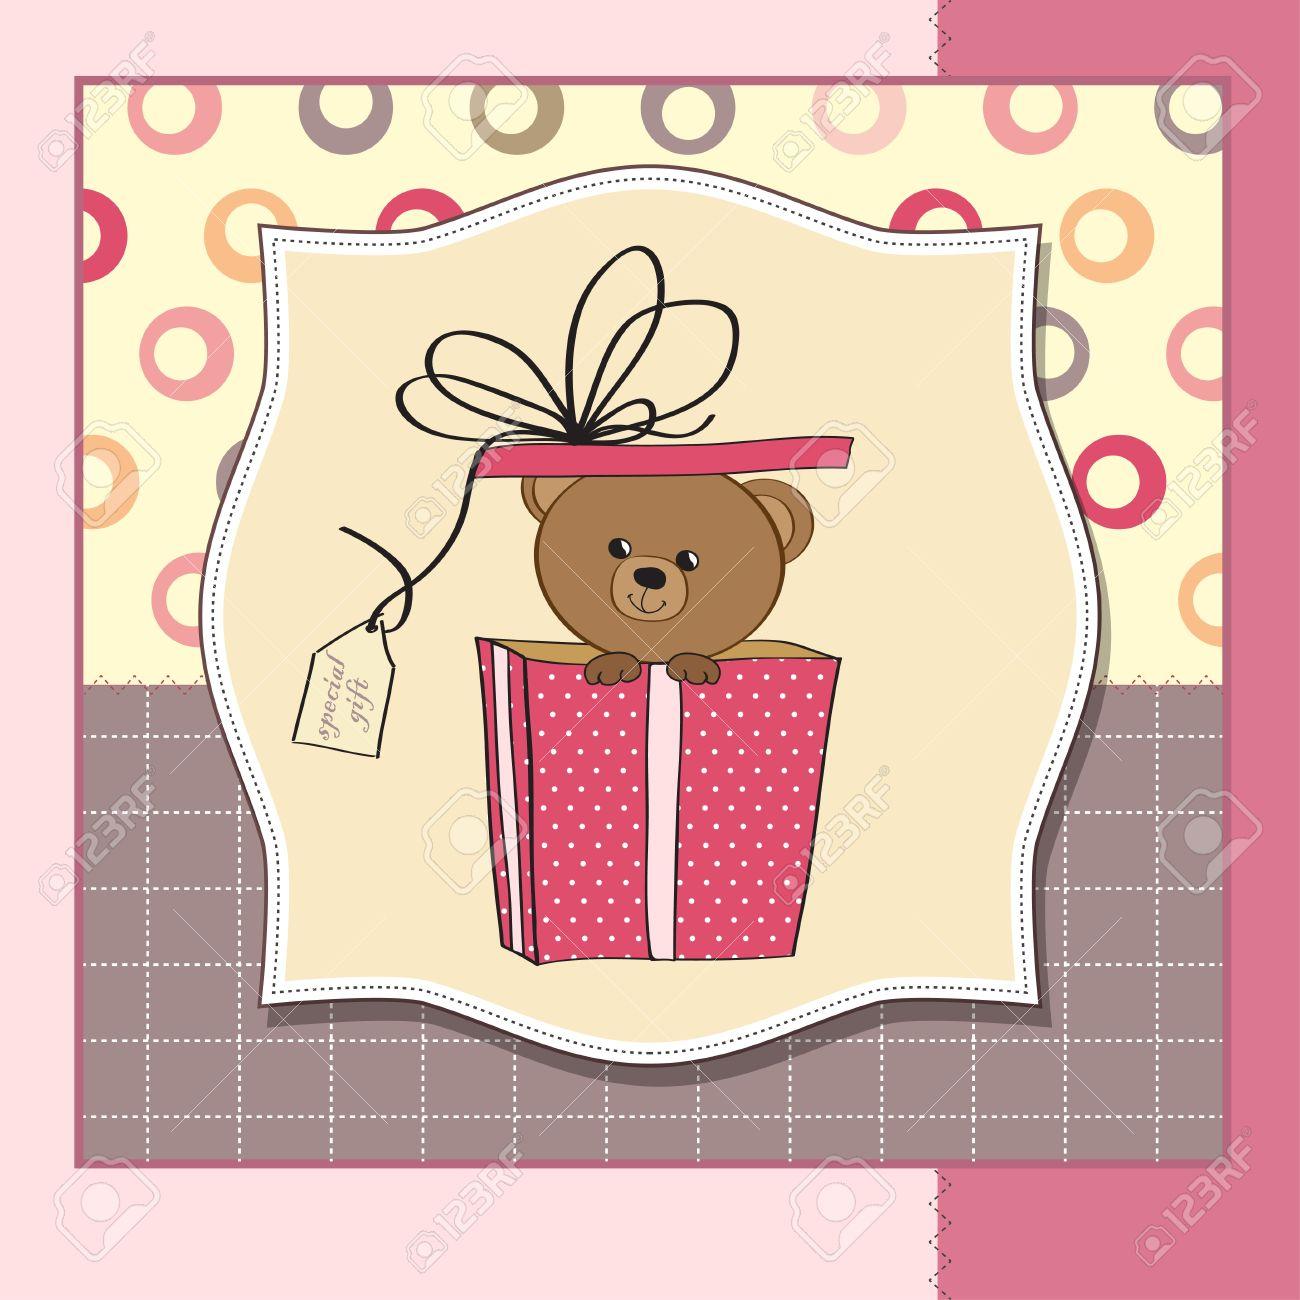 Birthday Greeting Card With Teddy Bear Royalty Free Cliparts – Birthday Card Bear